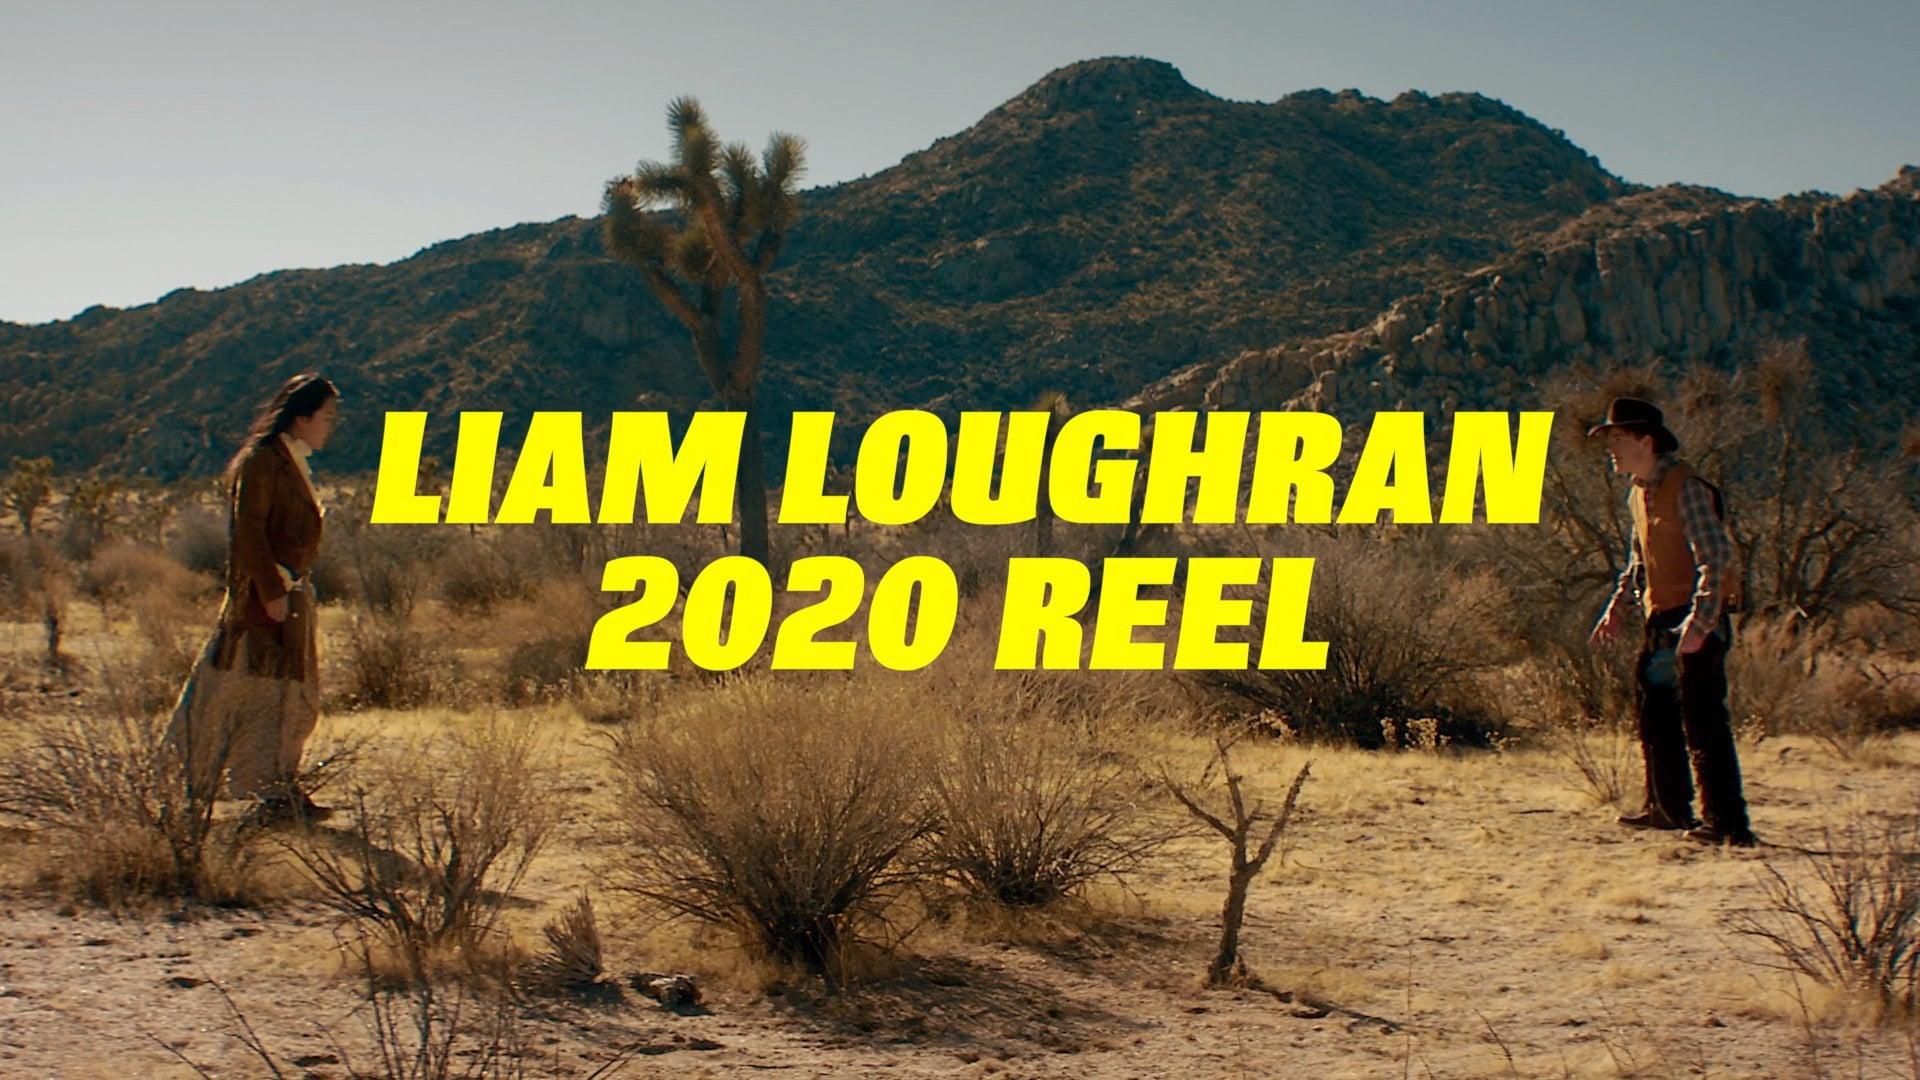 Liam Loughran 2020 Reel | Directing & Cinematography